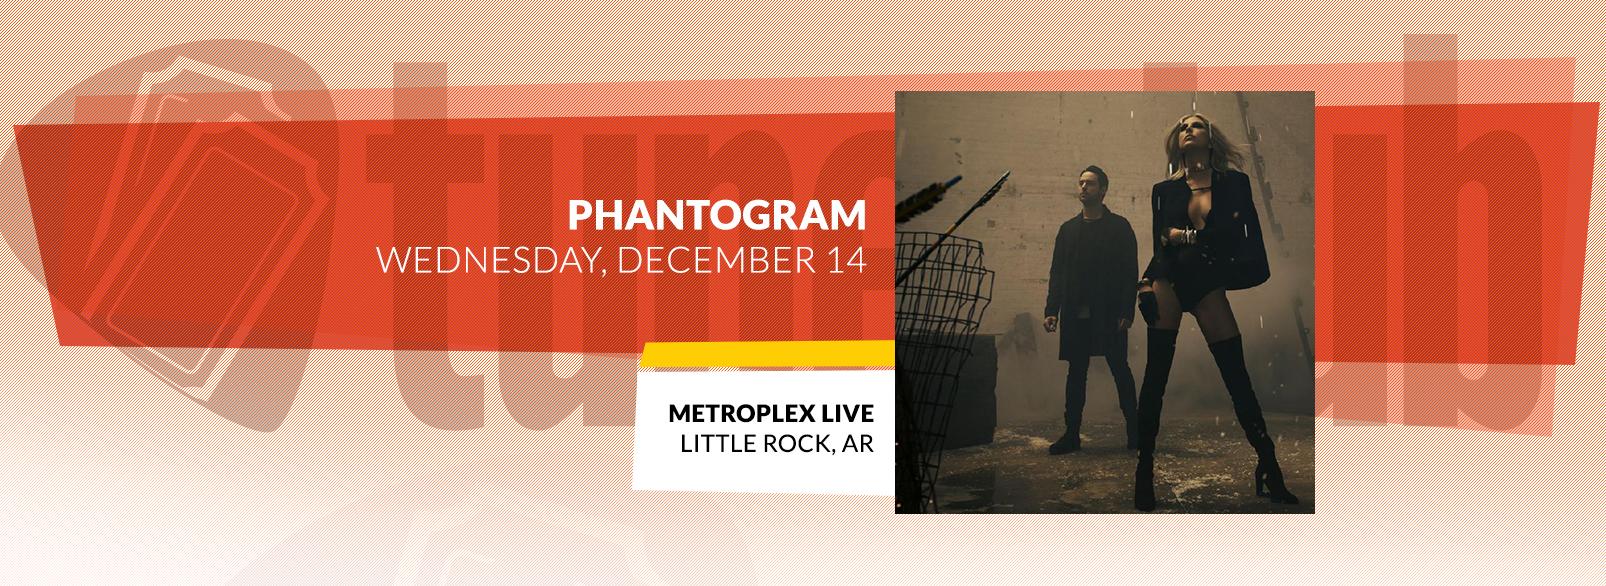 Phantogram @ Metroplex Live